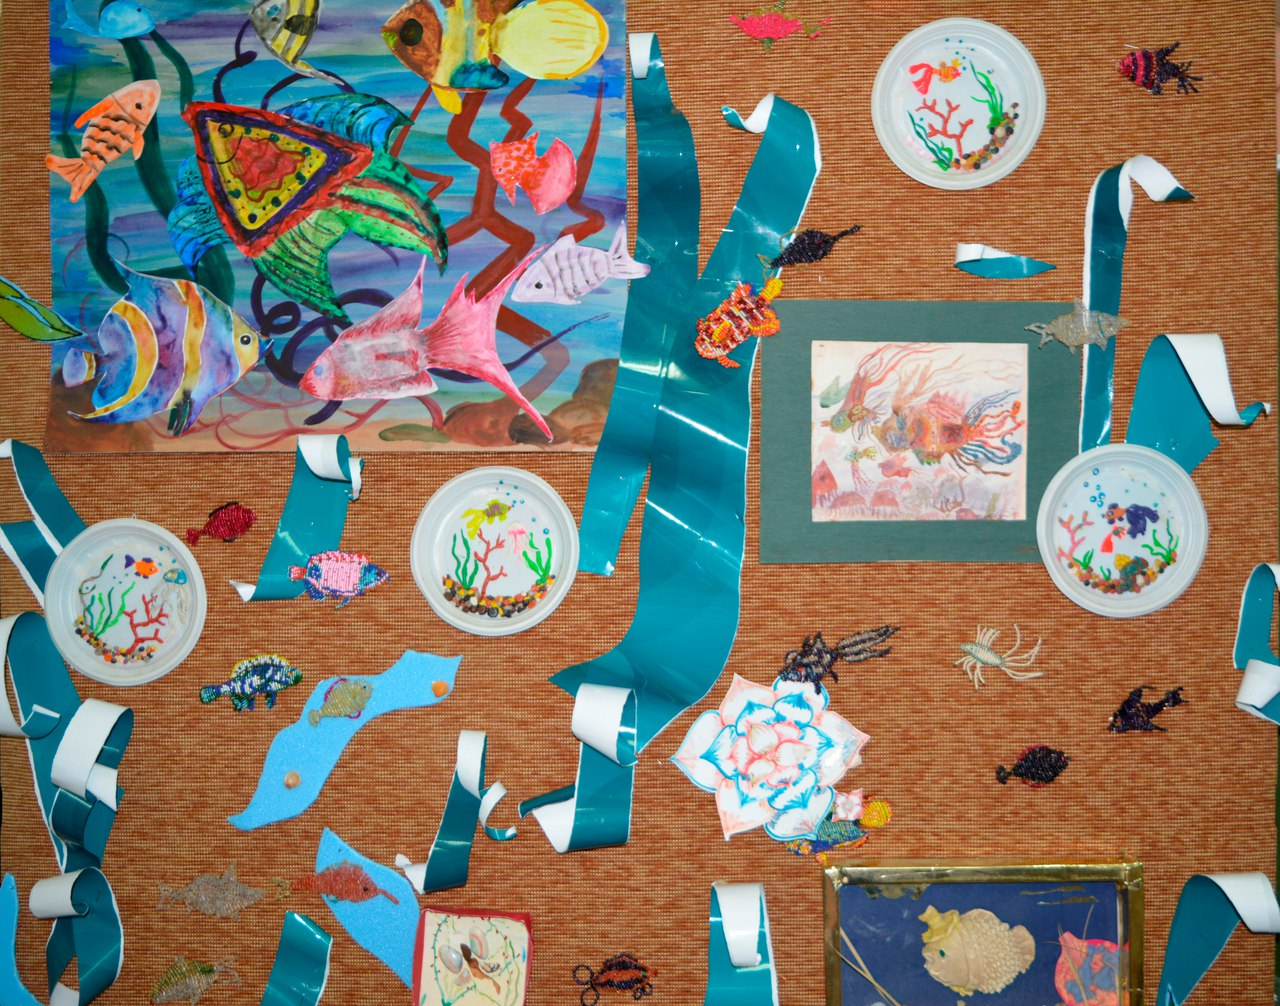 семинар-практикум Творчество и мир - стенд с работами учинеков студии